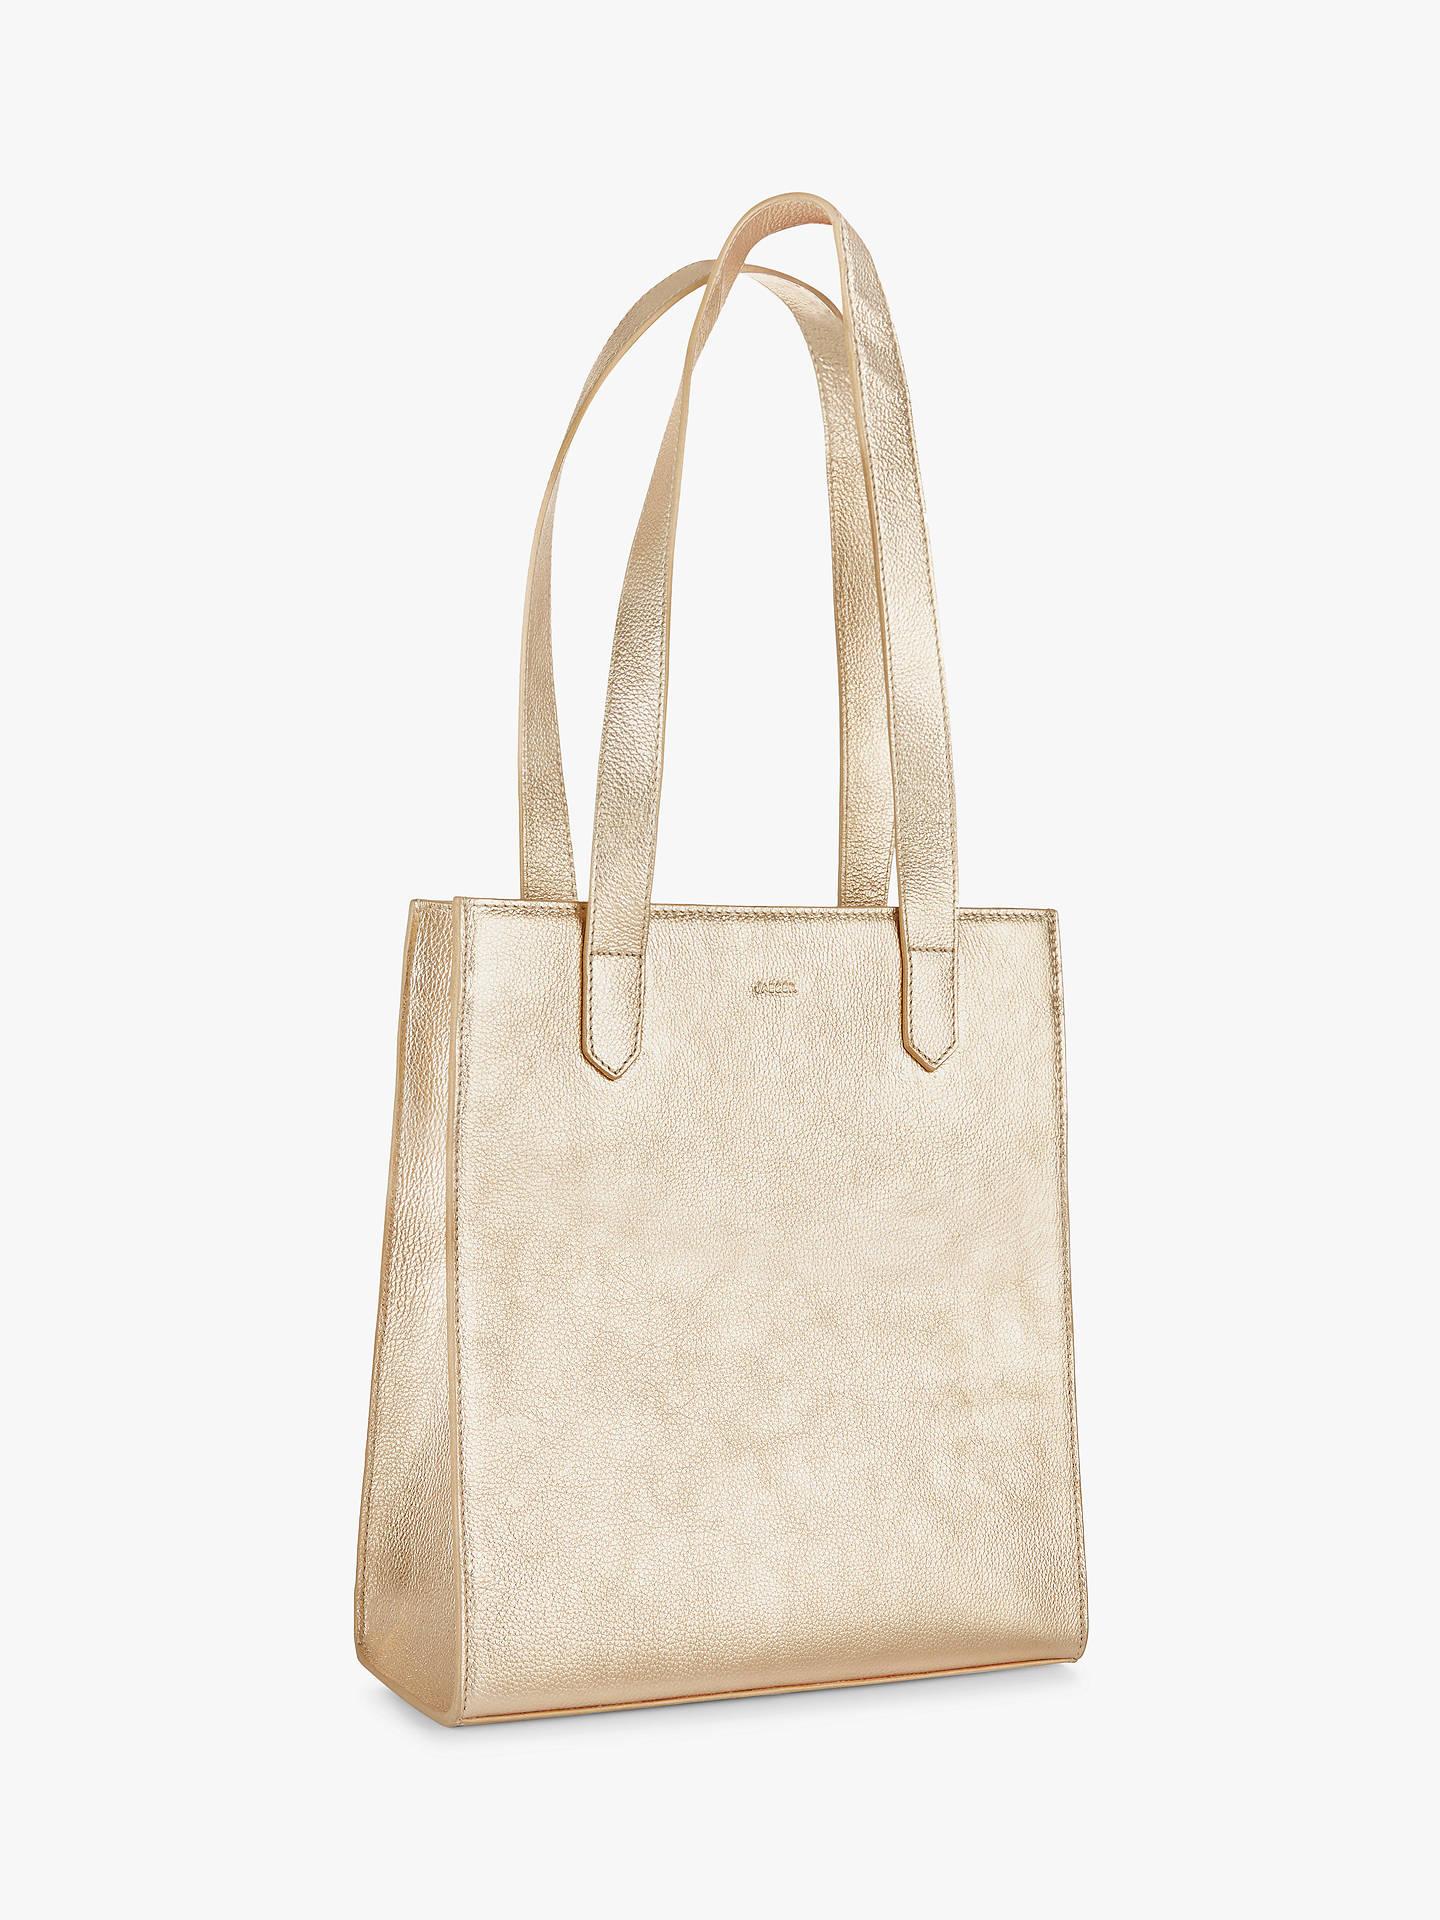 ee0d137dbc Jaeger Metallic Jennifer Leather Tote Bag, Gold